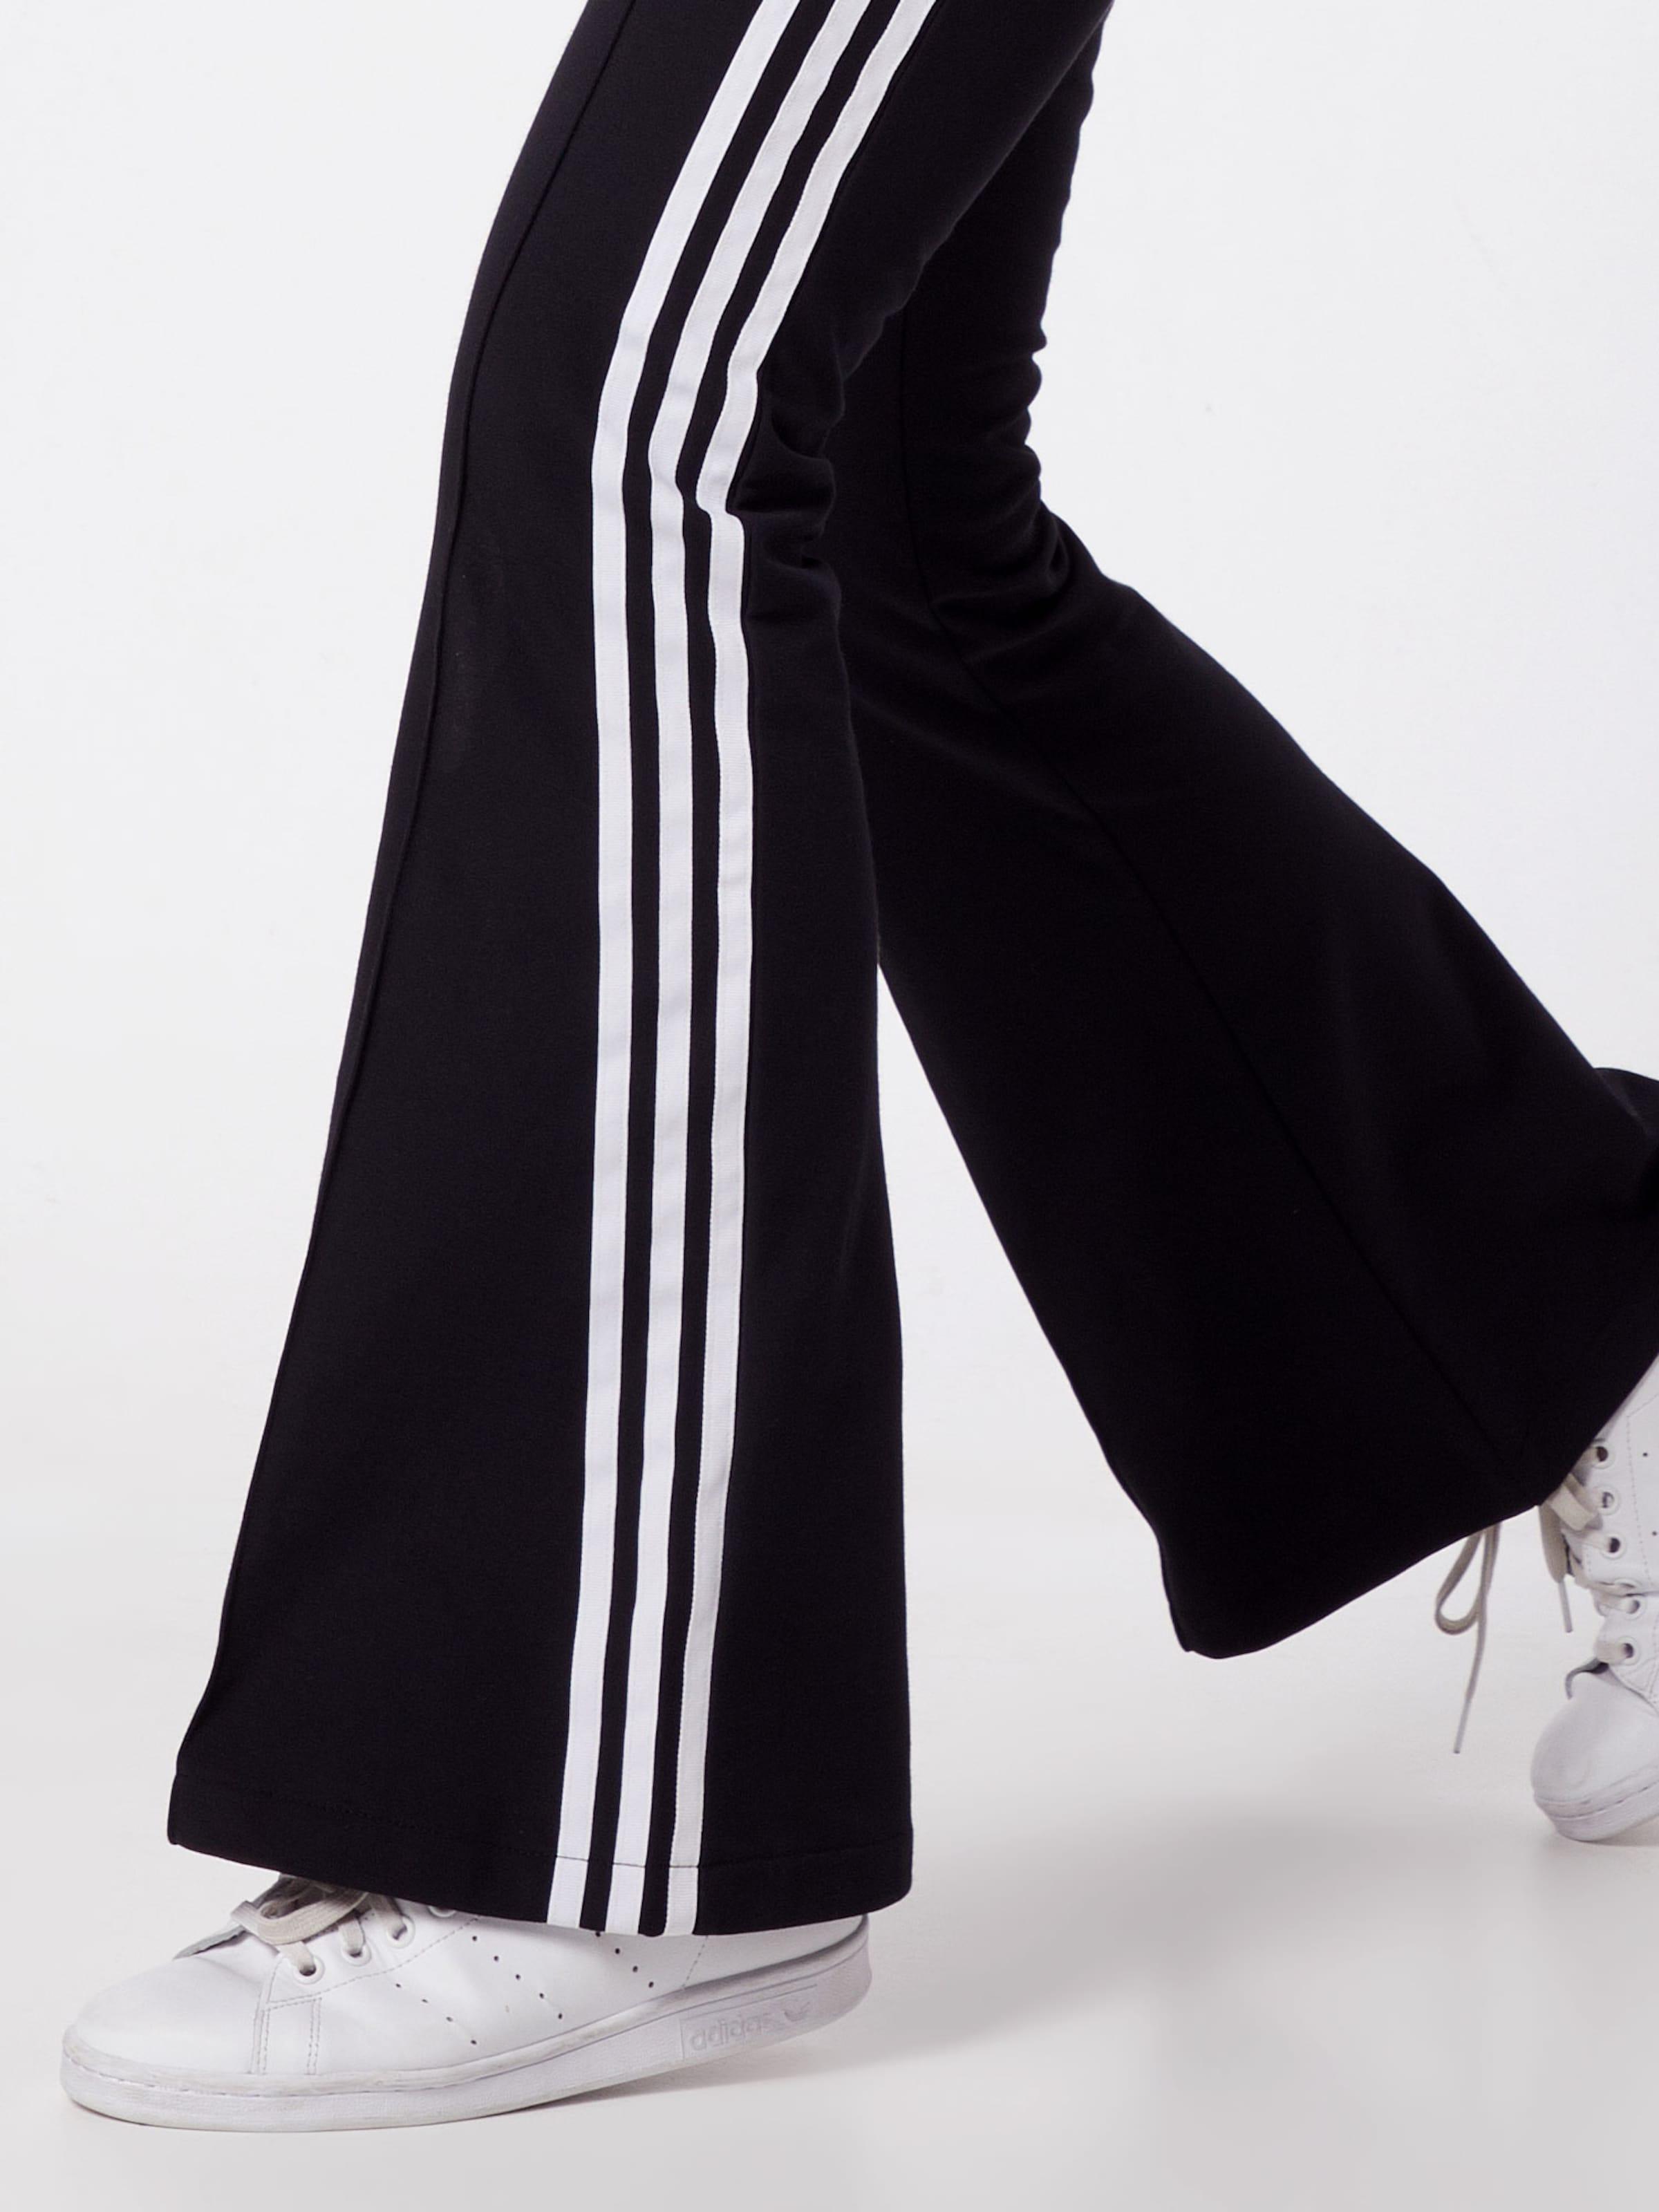 NoirBlanc Pantalon Pantalon Originals En Originals Adidas Adidas N0mwv8PynO